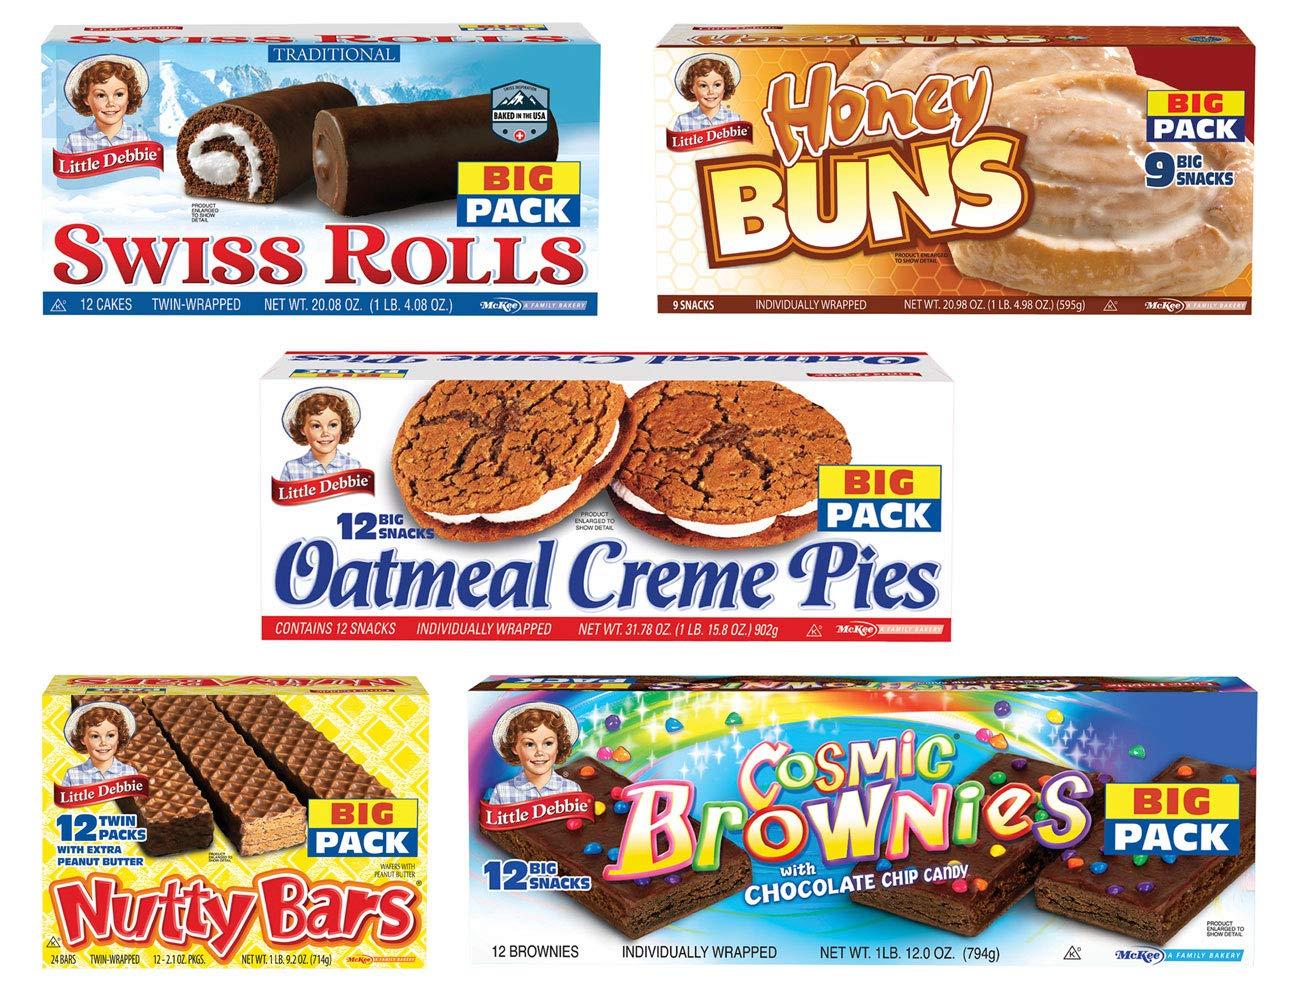 Little Debbie School Snacks Big Pack (5boxes): Honey Buns, Cosmic Brownies, Oatmeal Pies, Nutty Bars, Swiss Rolls by lil deb (Image #1)